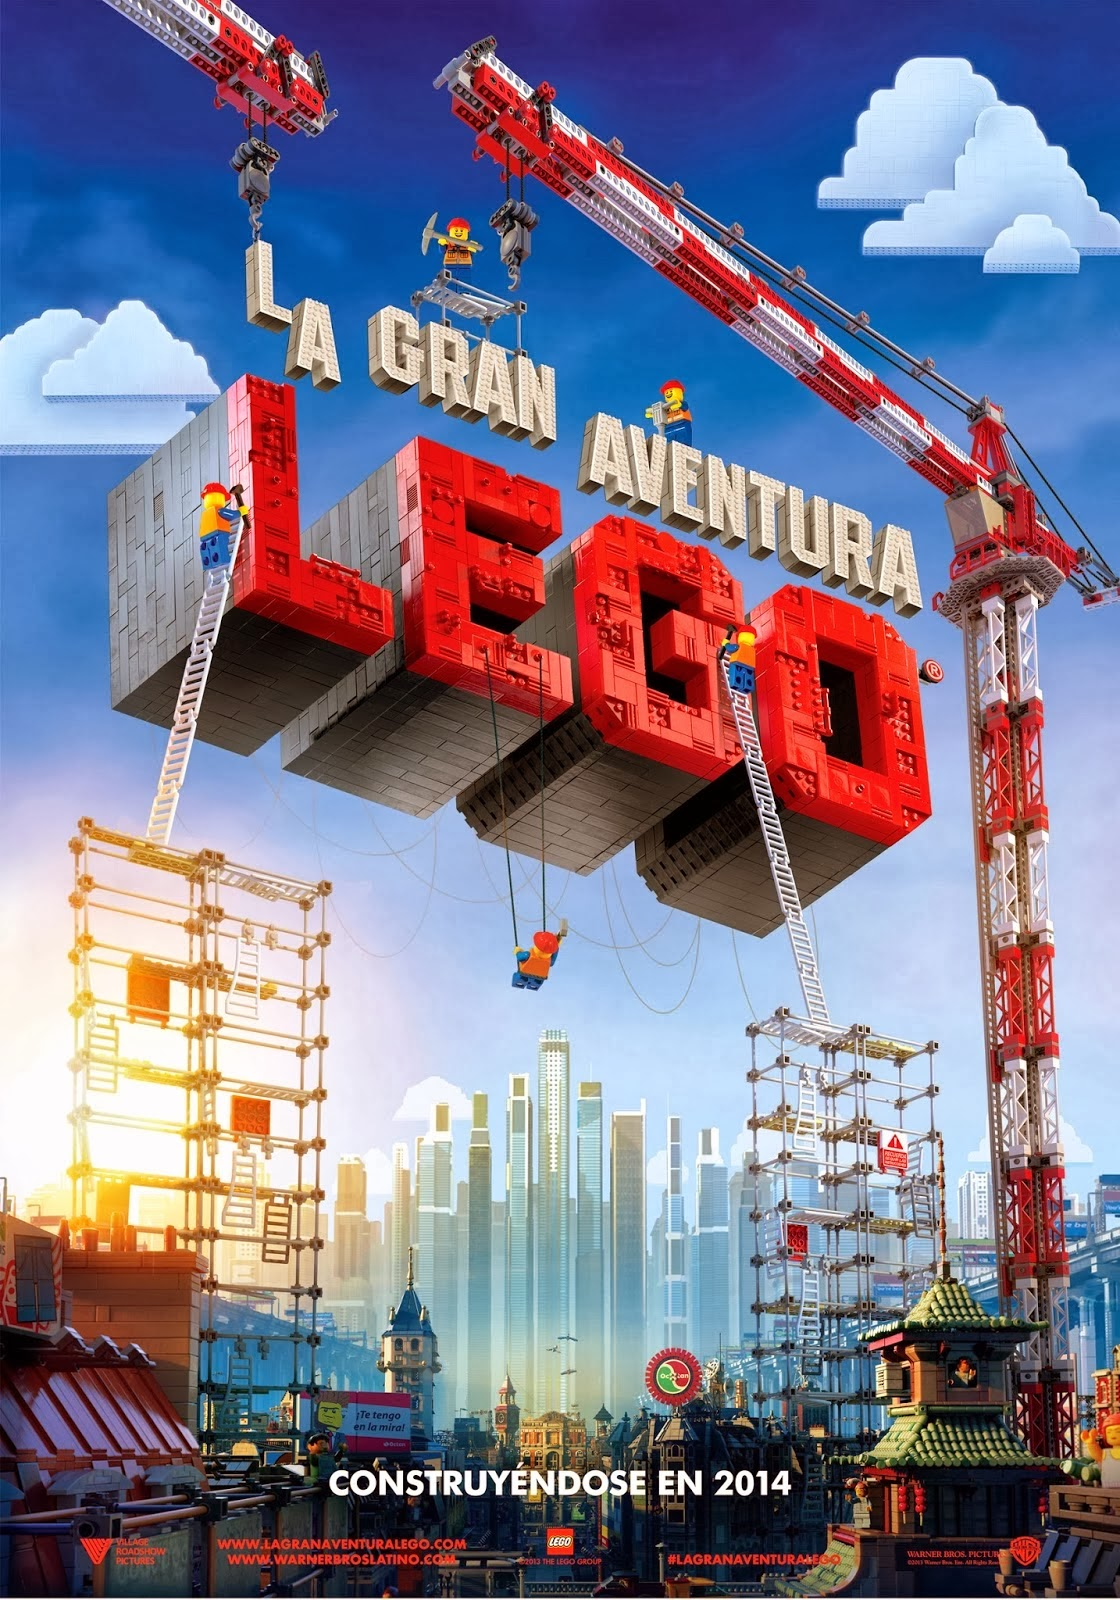 Poster de La Gran Aventura Lego